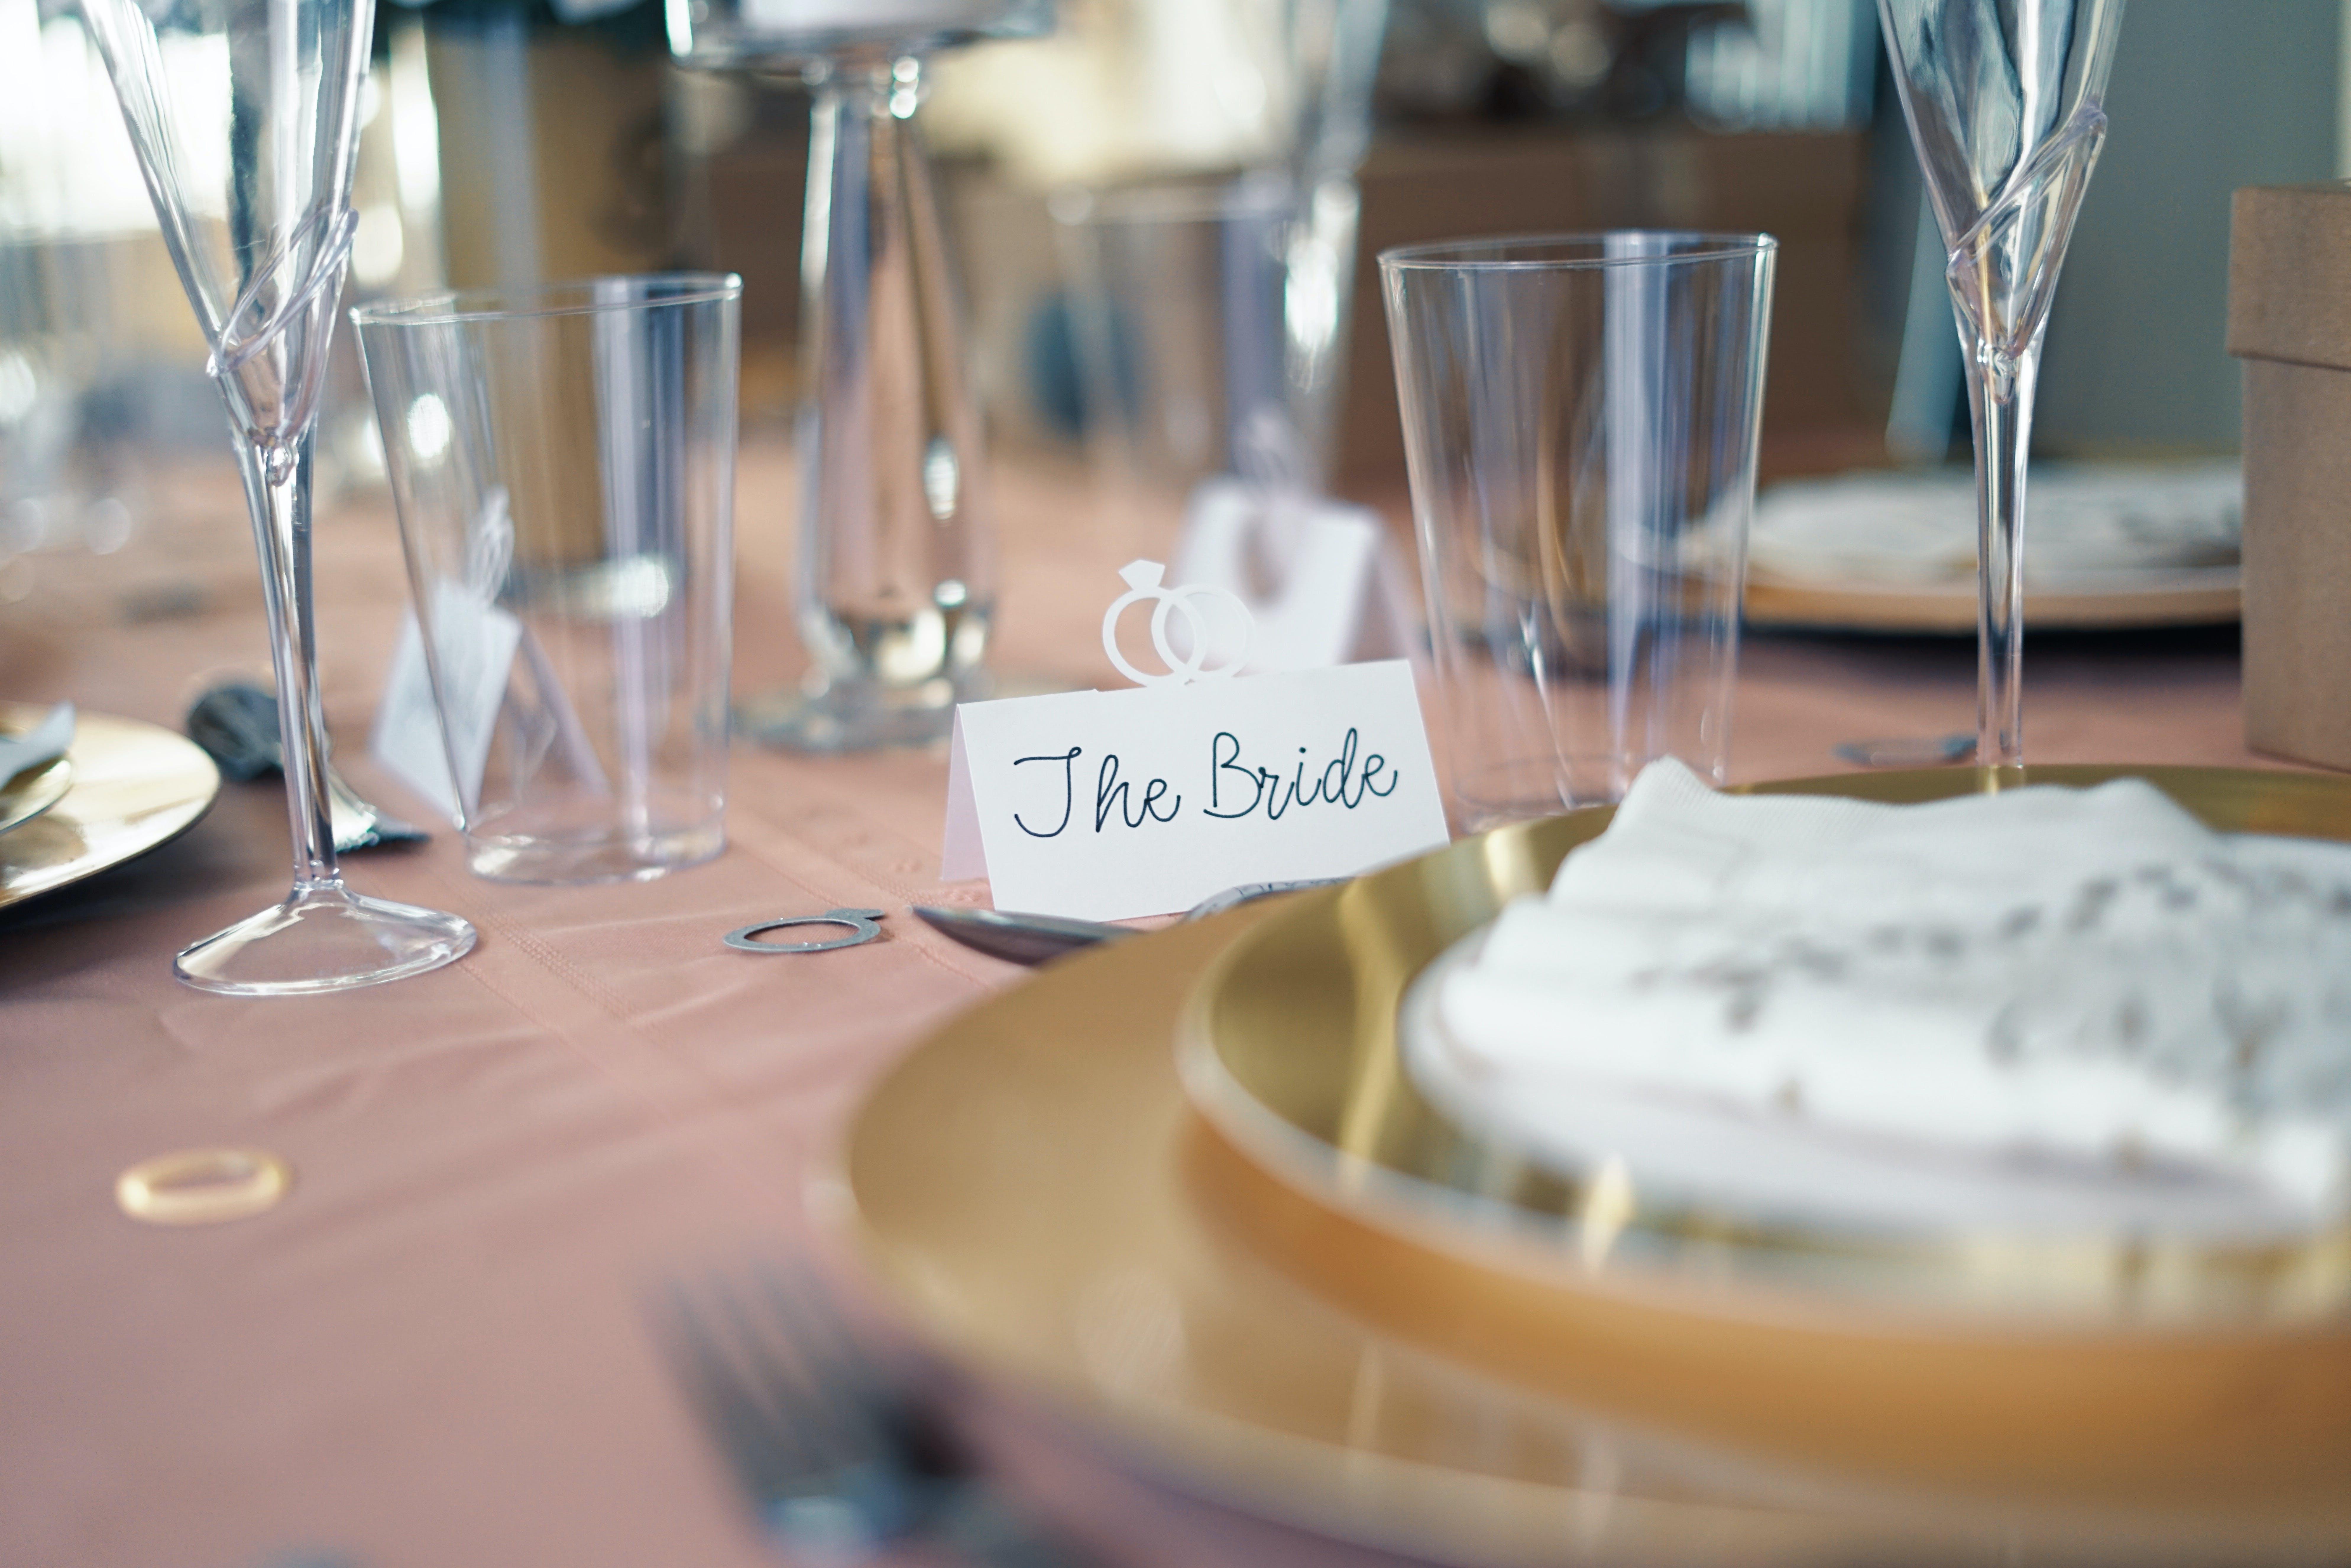 The Bride Flaglet Miniature